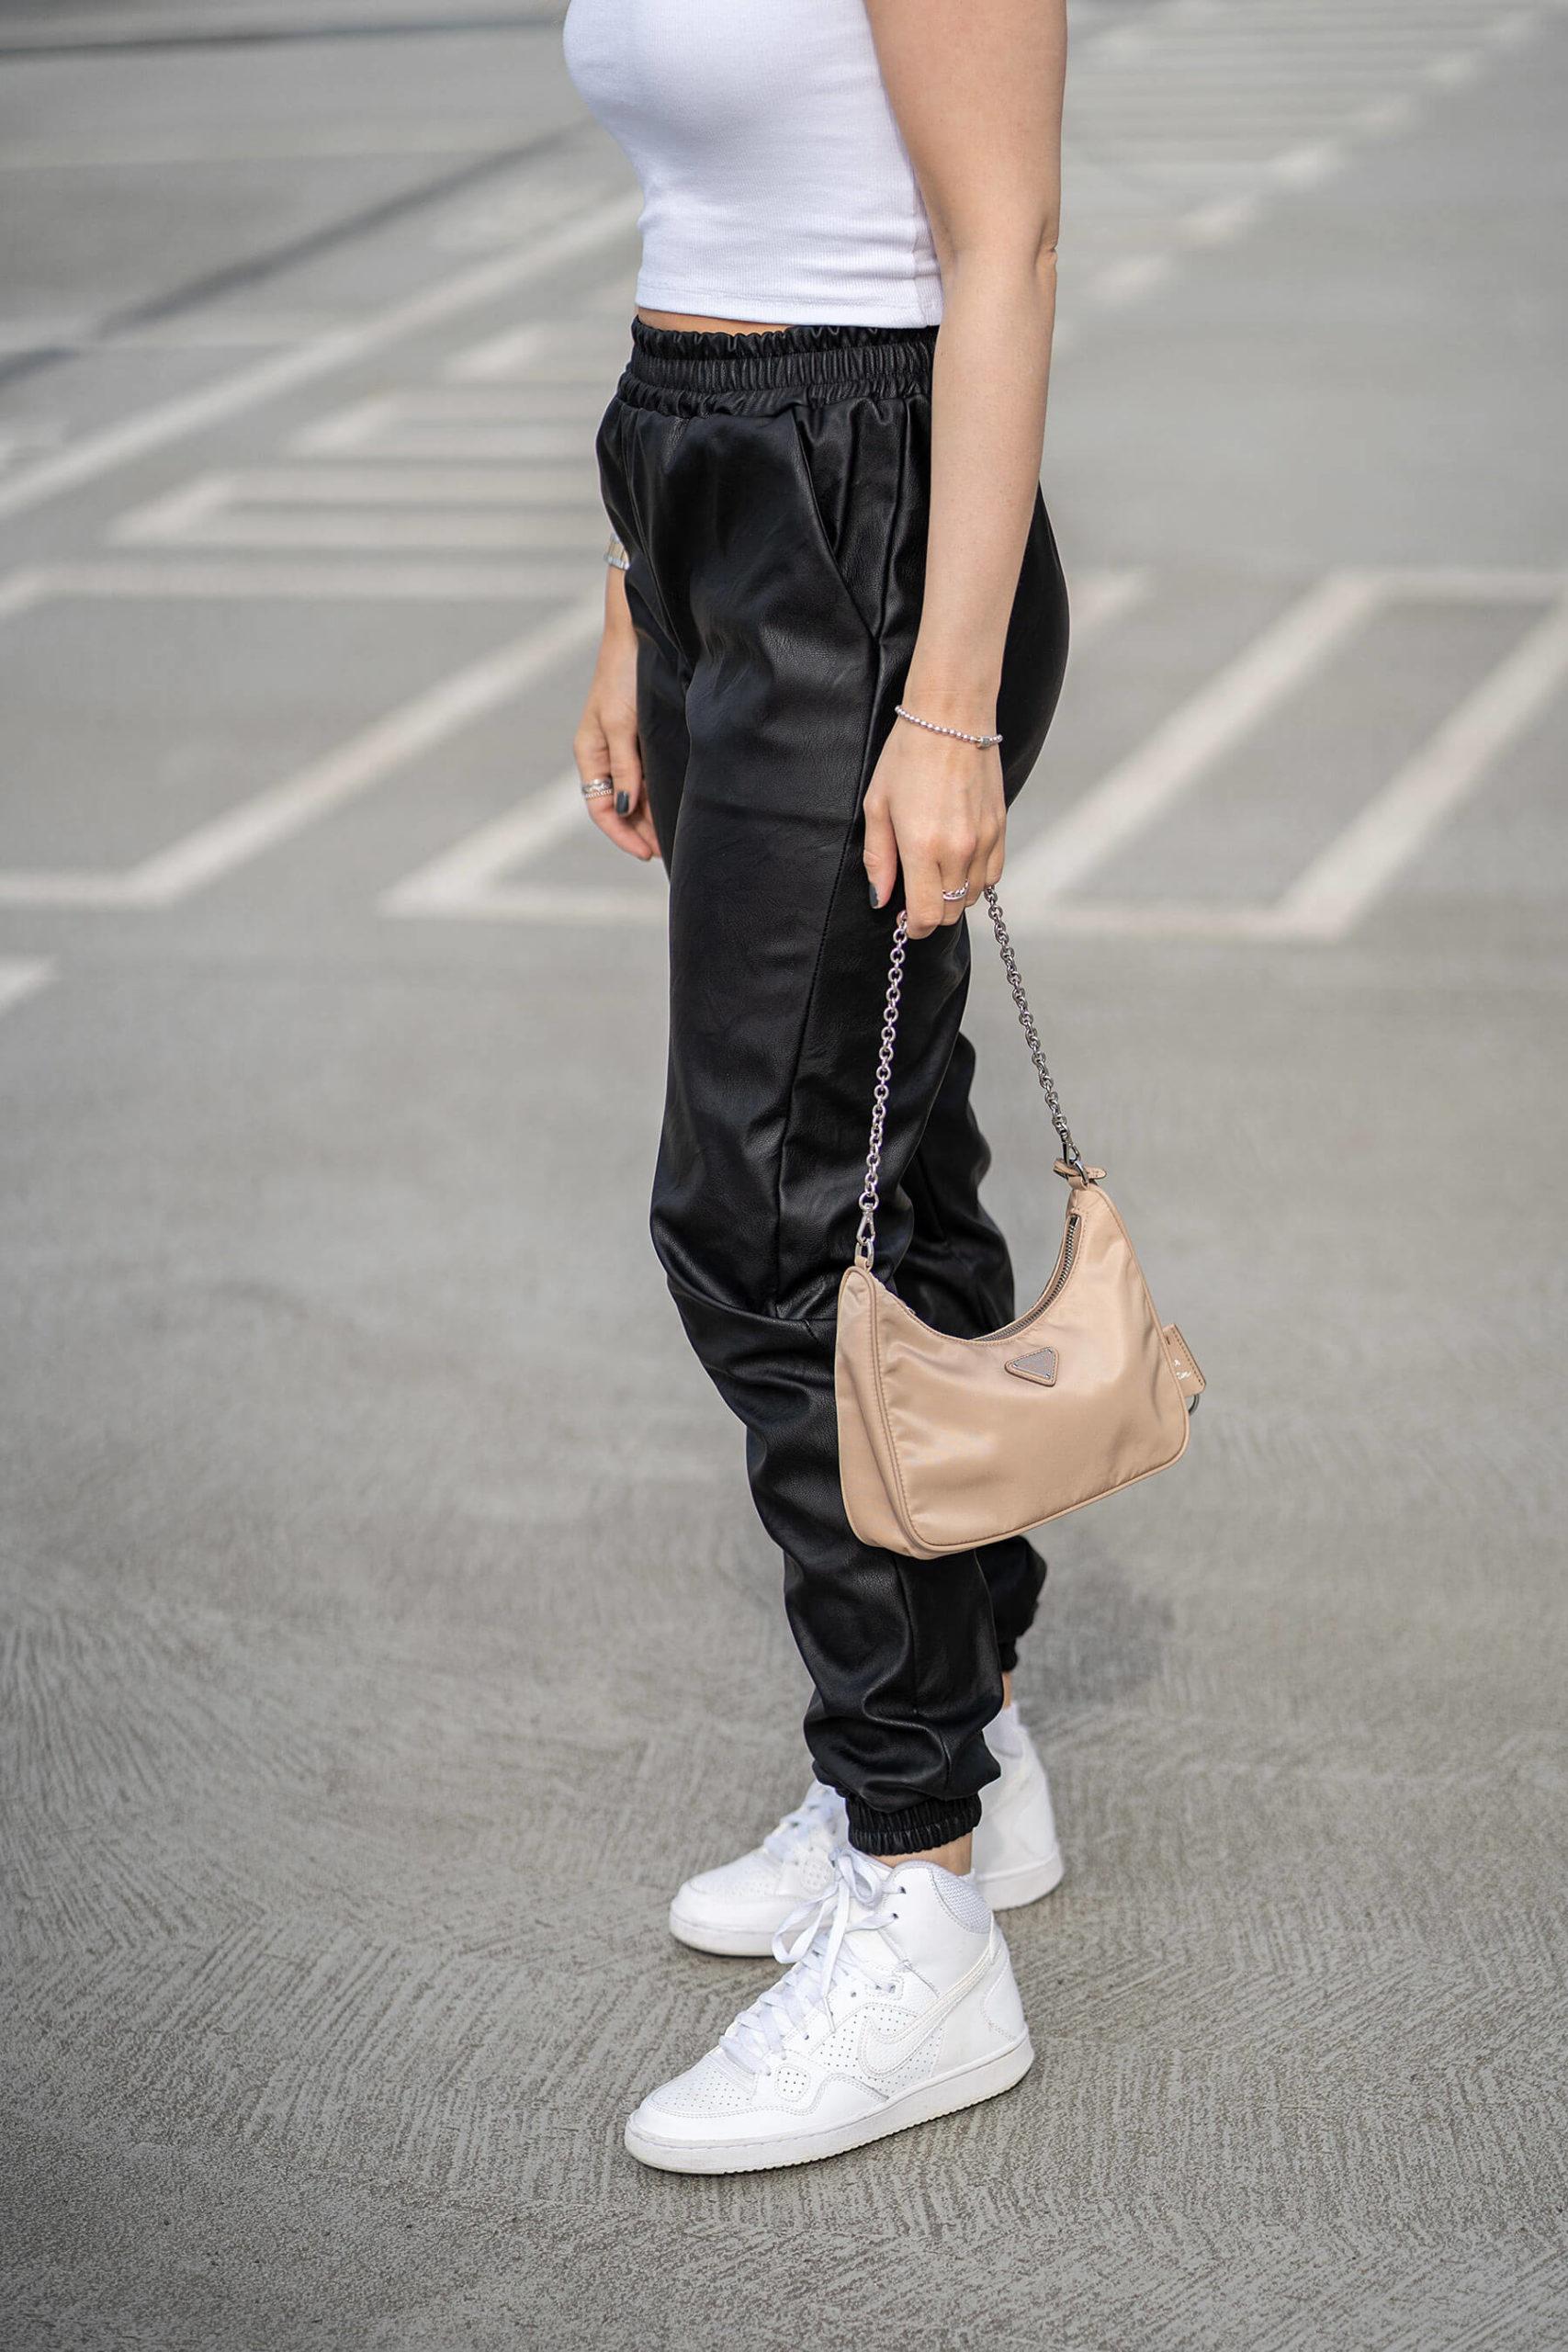 schwarz weiss outfit fashion blogger nike inga brauer